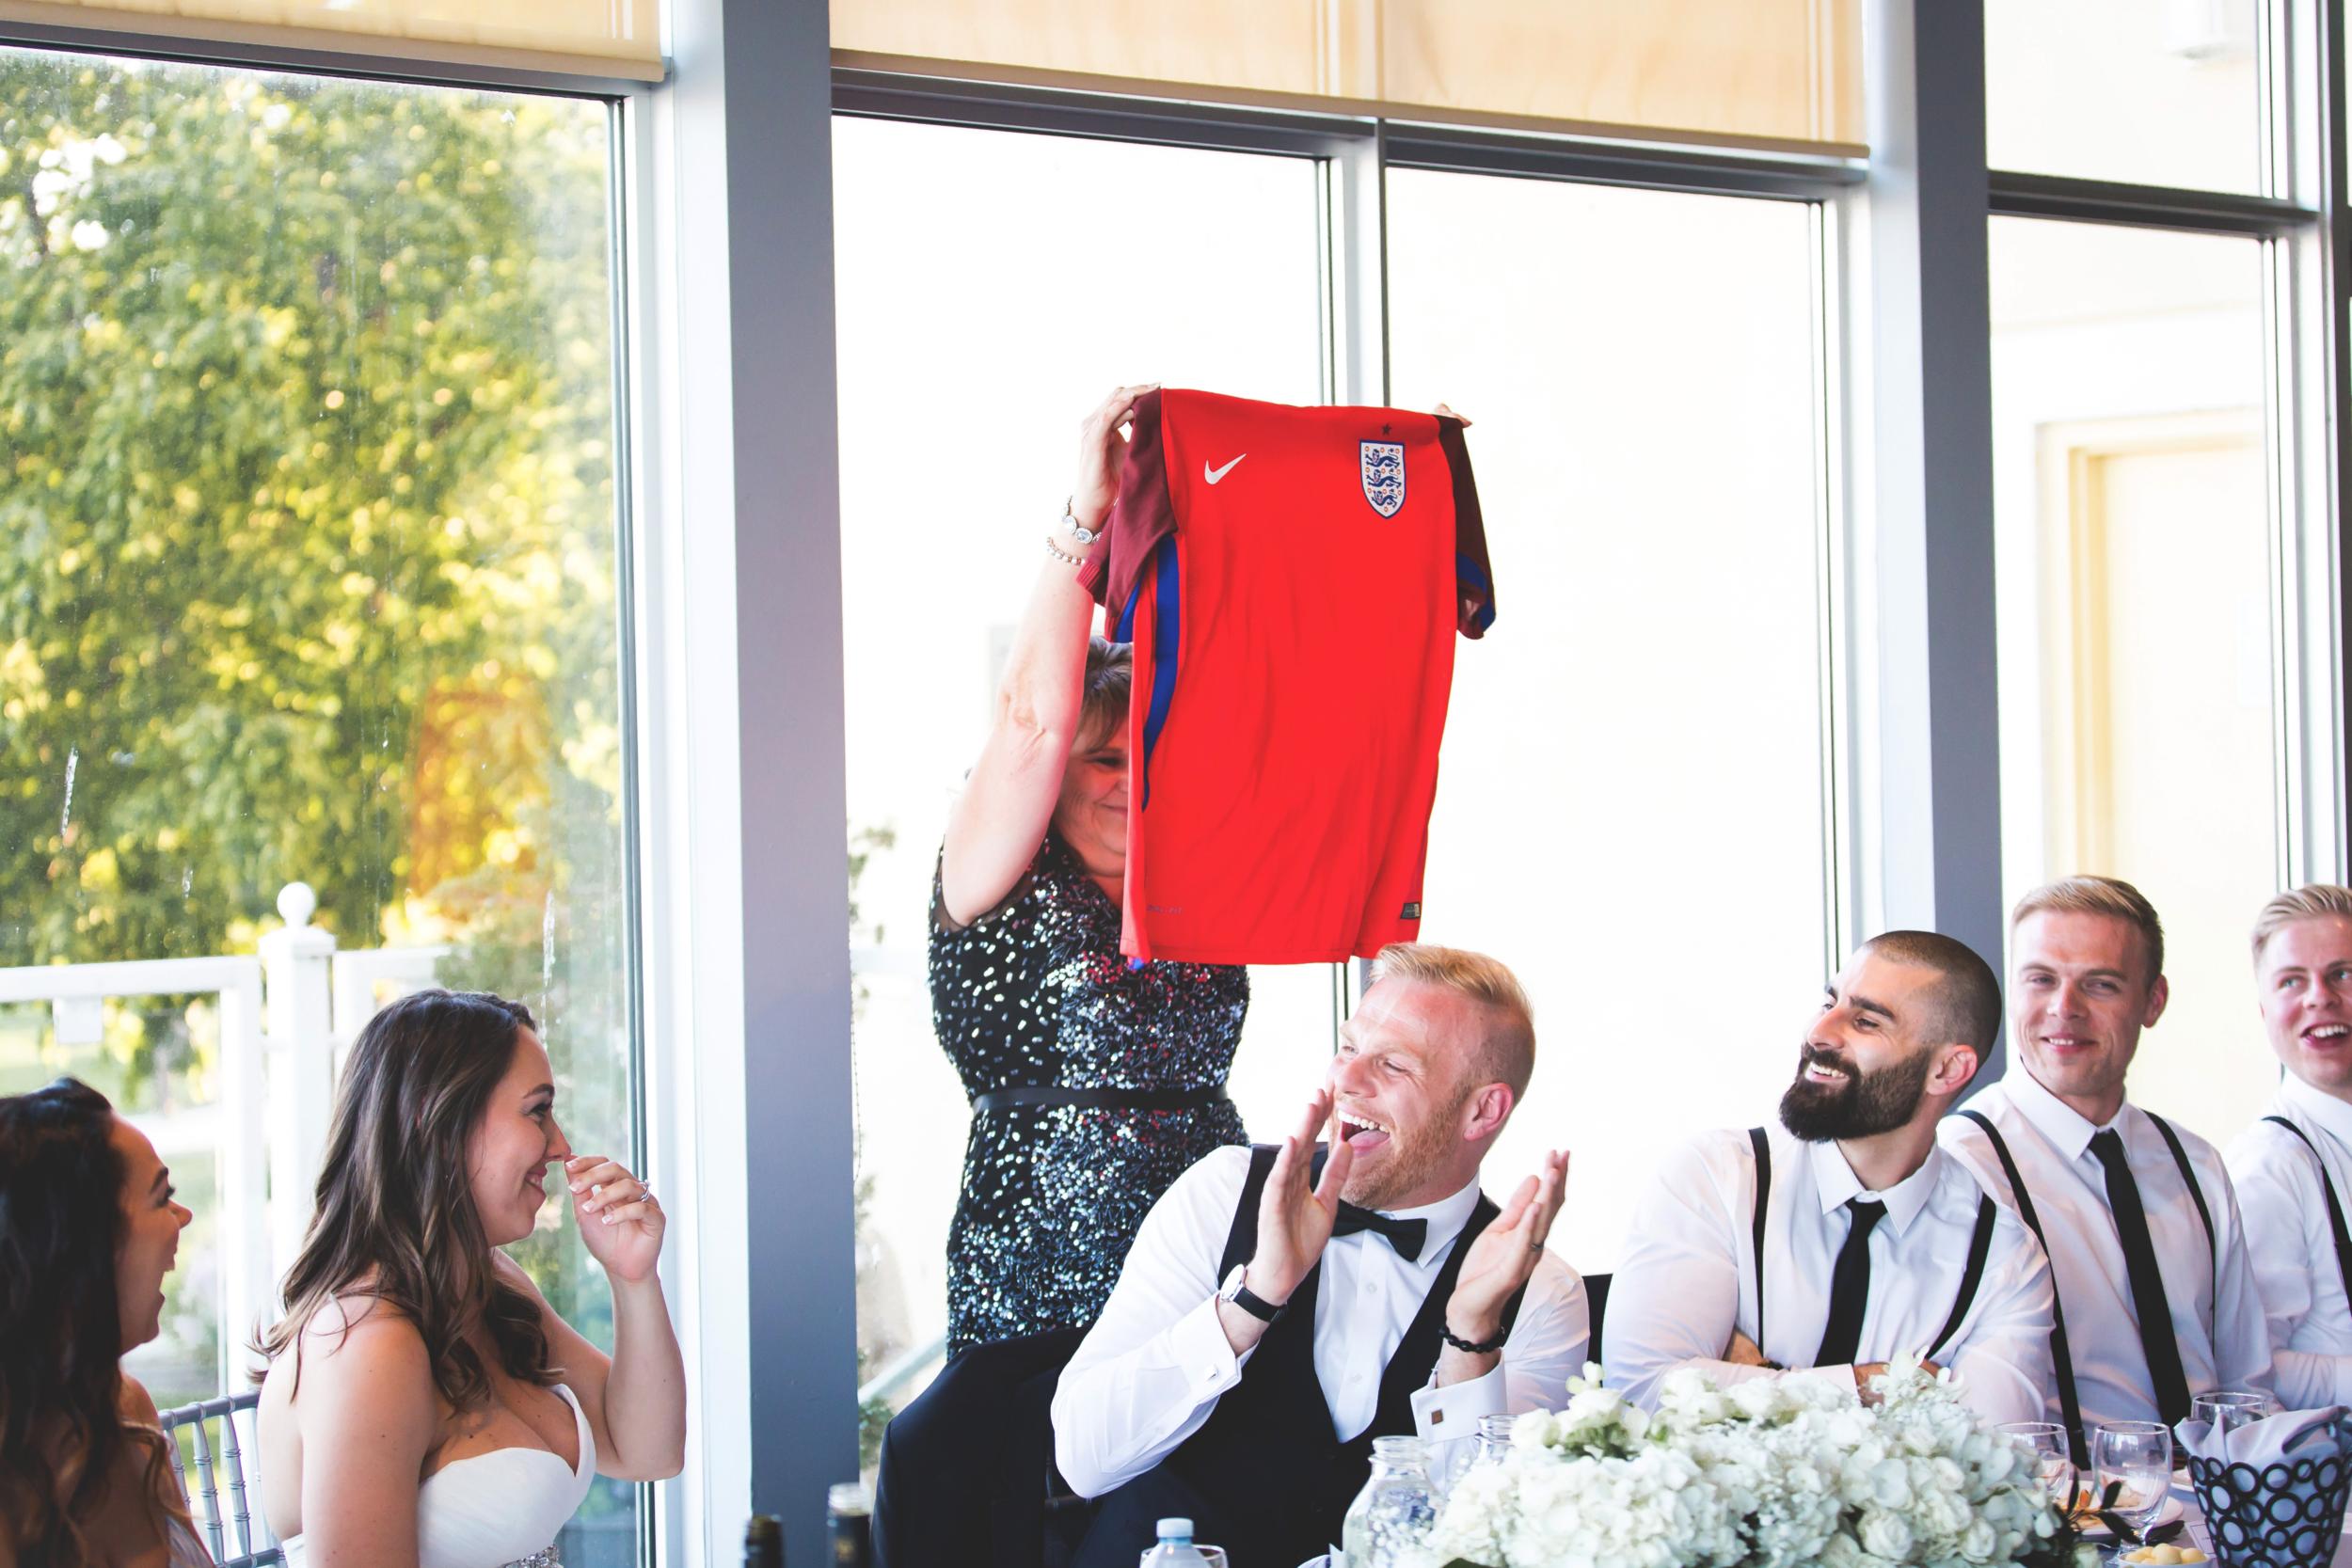 Wedding-Harbour-Banquet-Center-Oakville-Photographer-Wedding-Hamilton-Saint-James-Espresso-Downtown-HamOnt-GTA-Niagara-Toronto-Moments-by-Lauren-Photography-Photo-Image-64.png